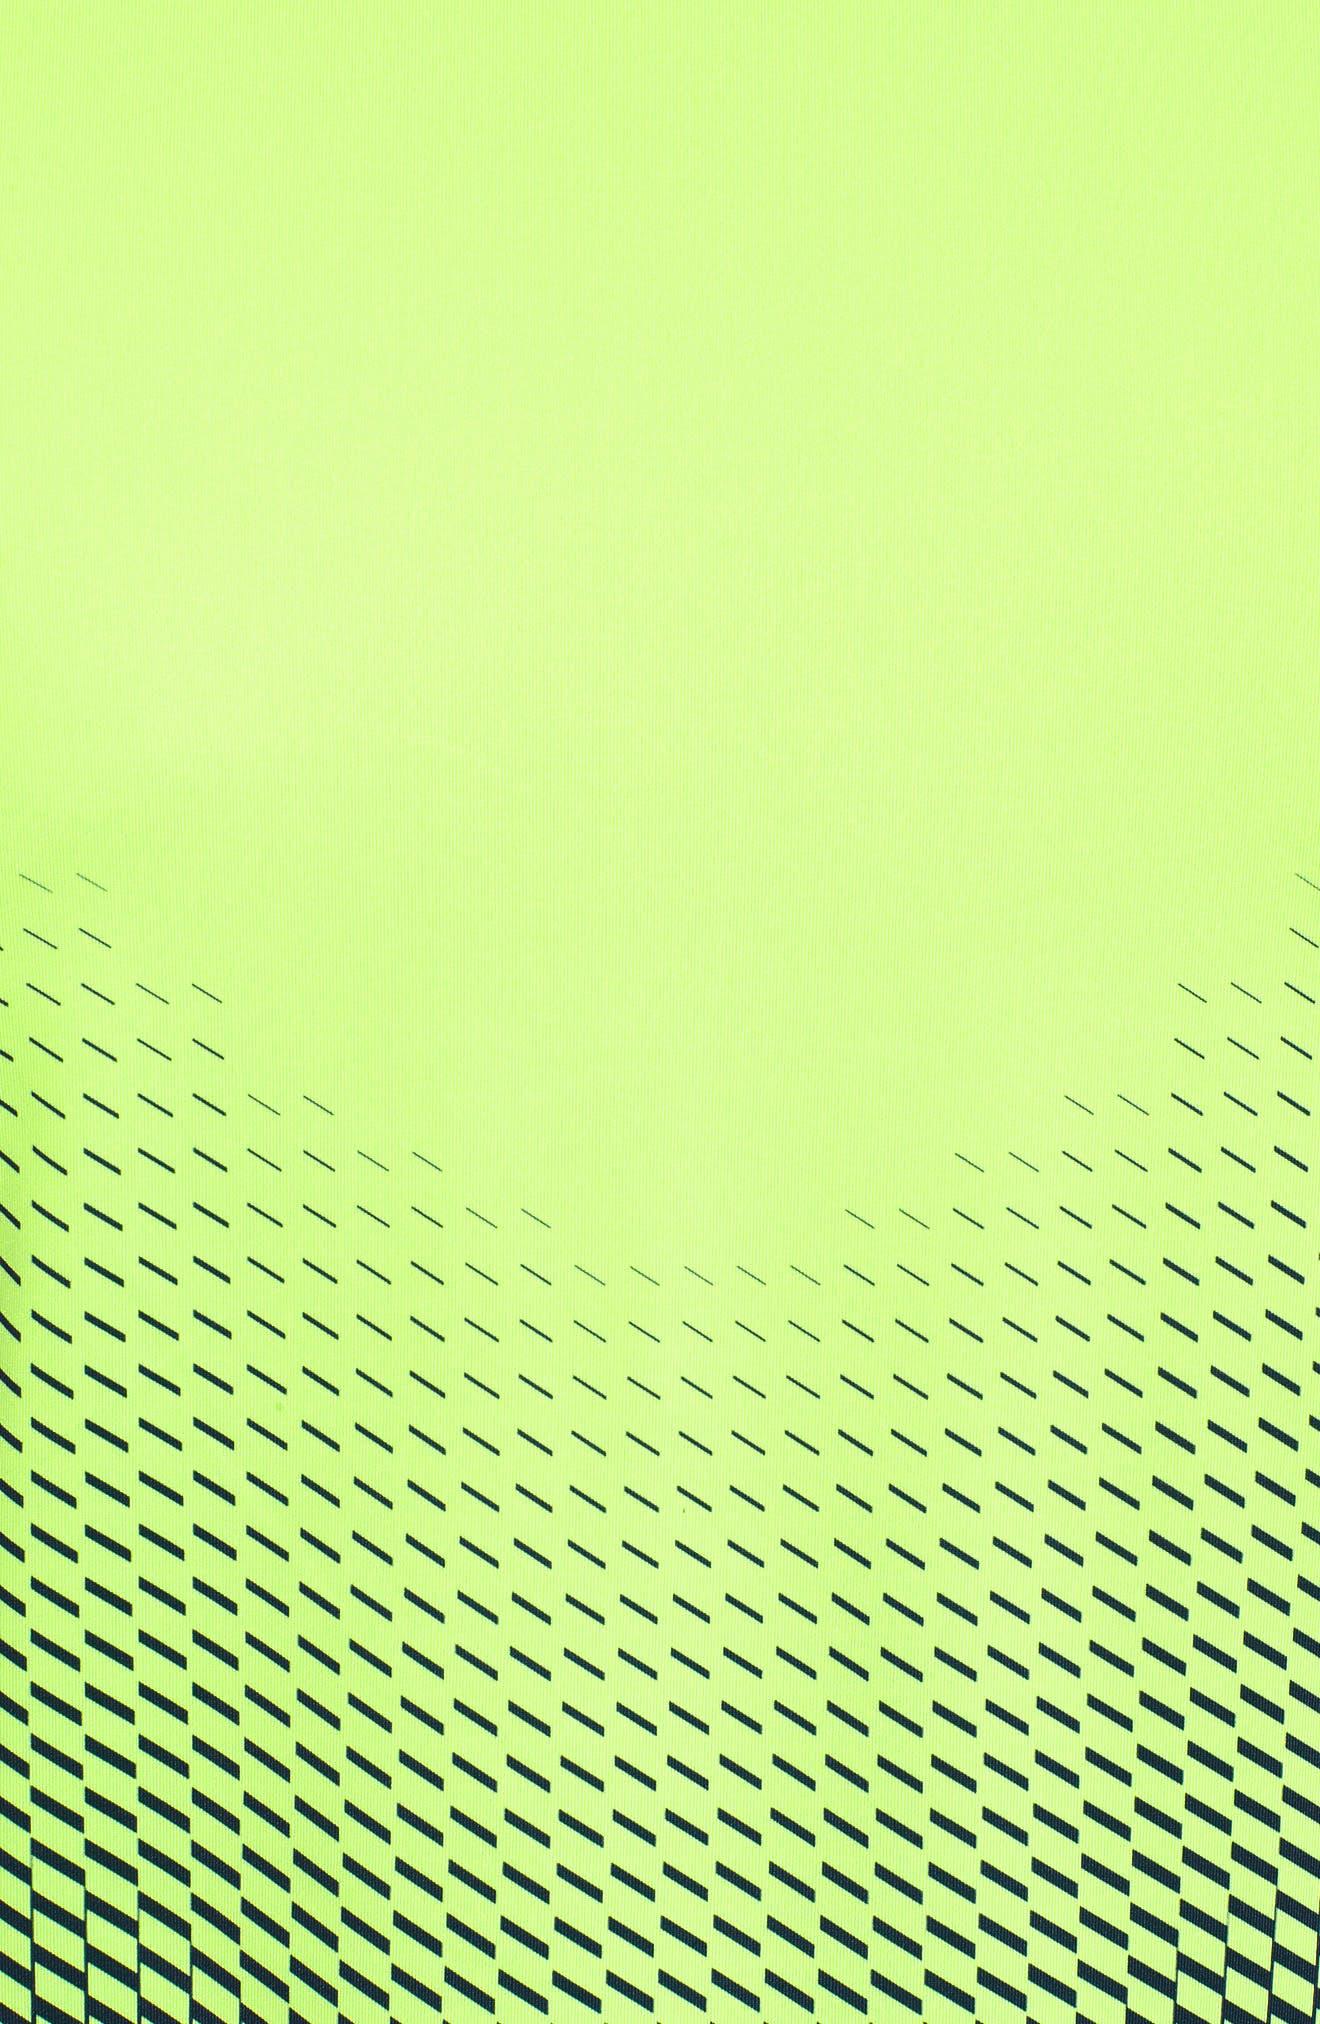 MK1 Dash Crewneck T-Shirt,                             Alternate thumbnail 5, color,                             Lime / Academy / Graphite